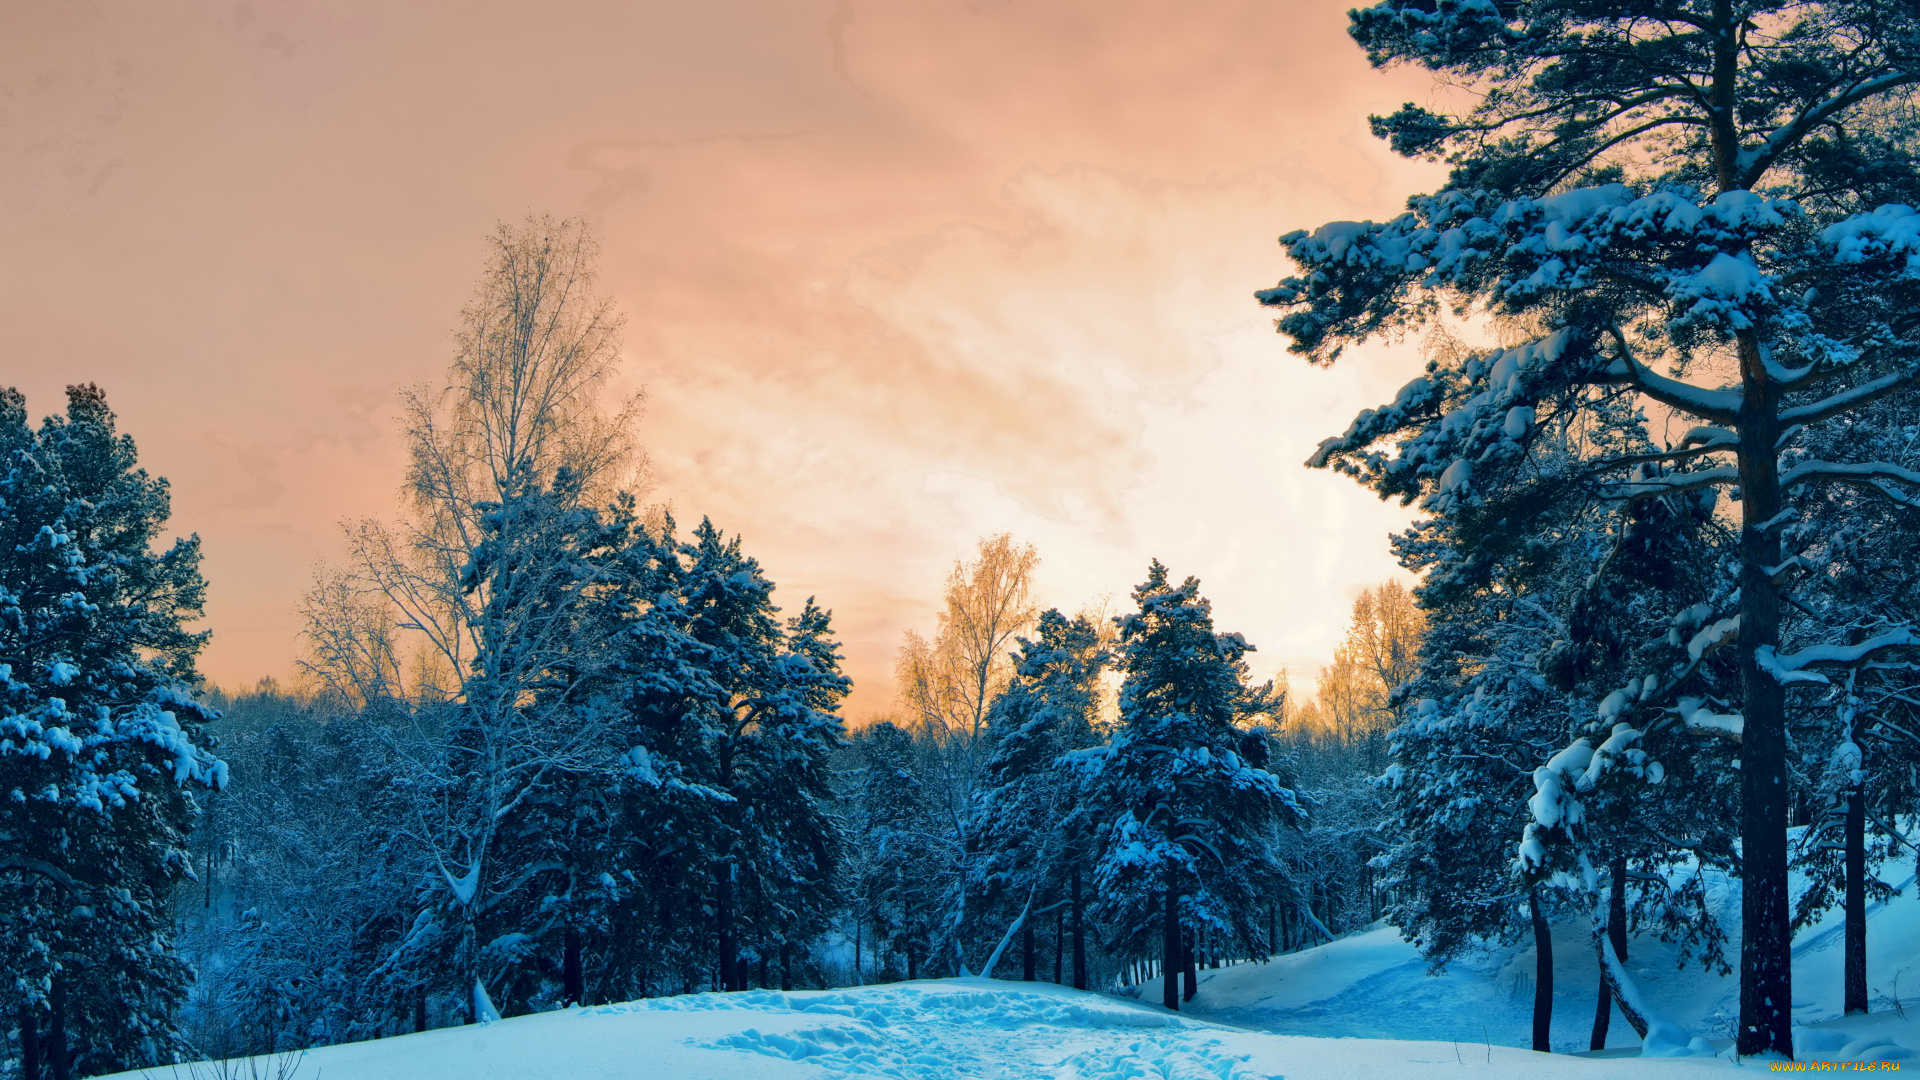 природа зима небо деревья на телефон